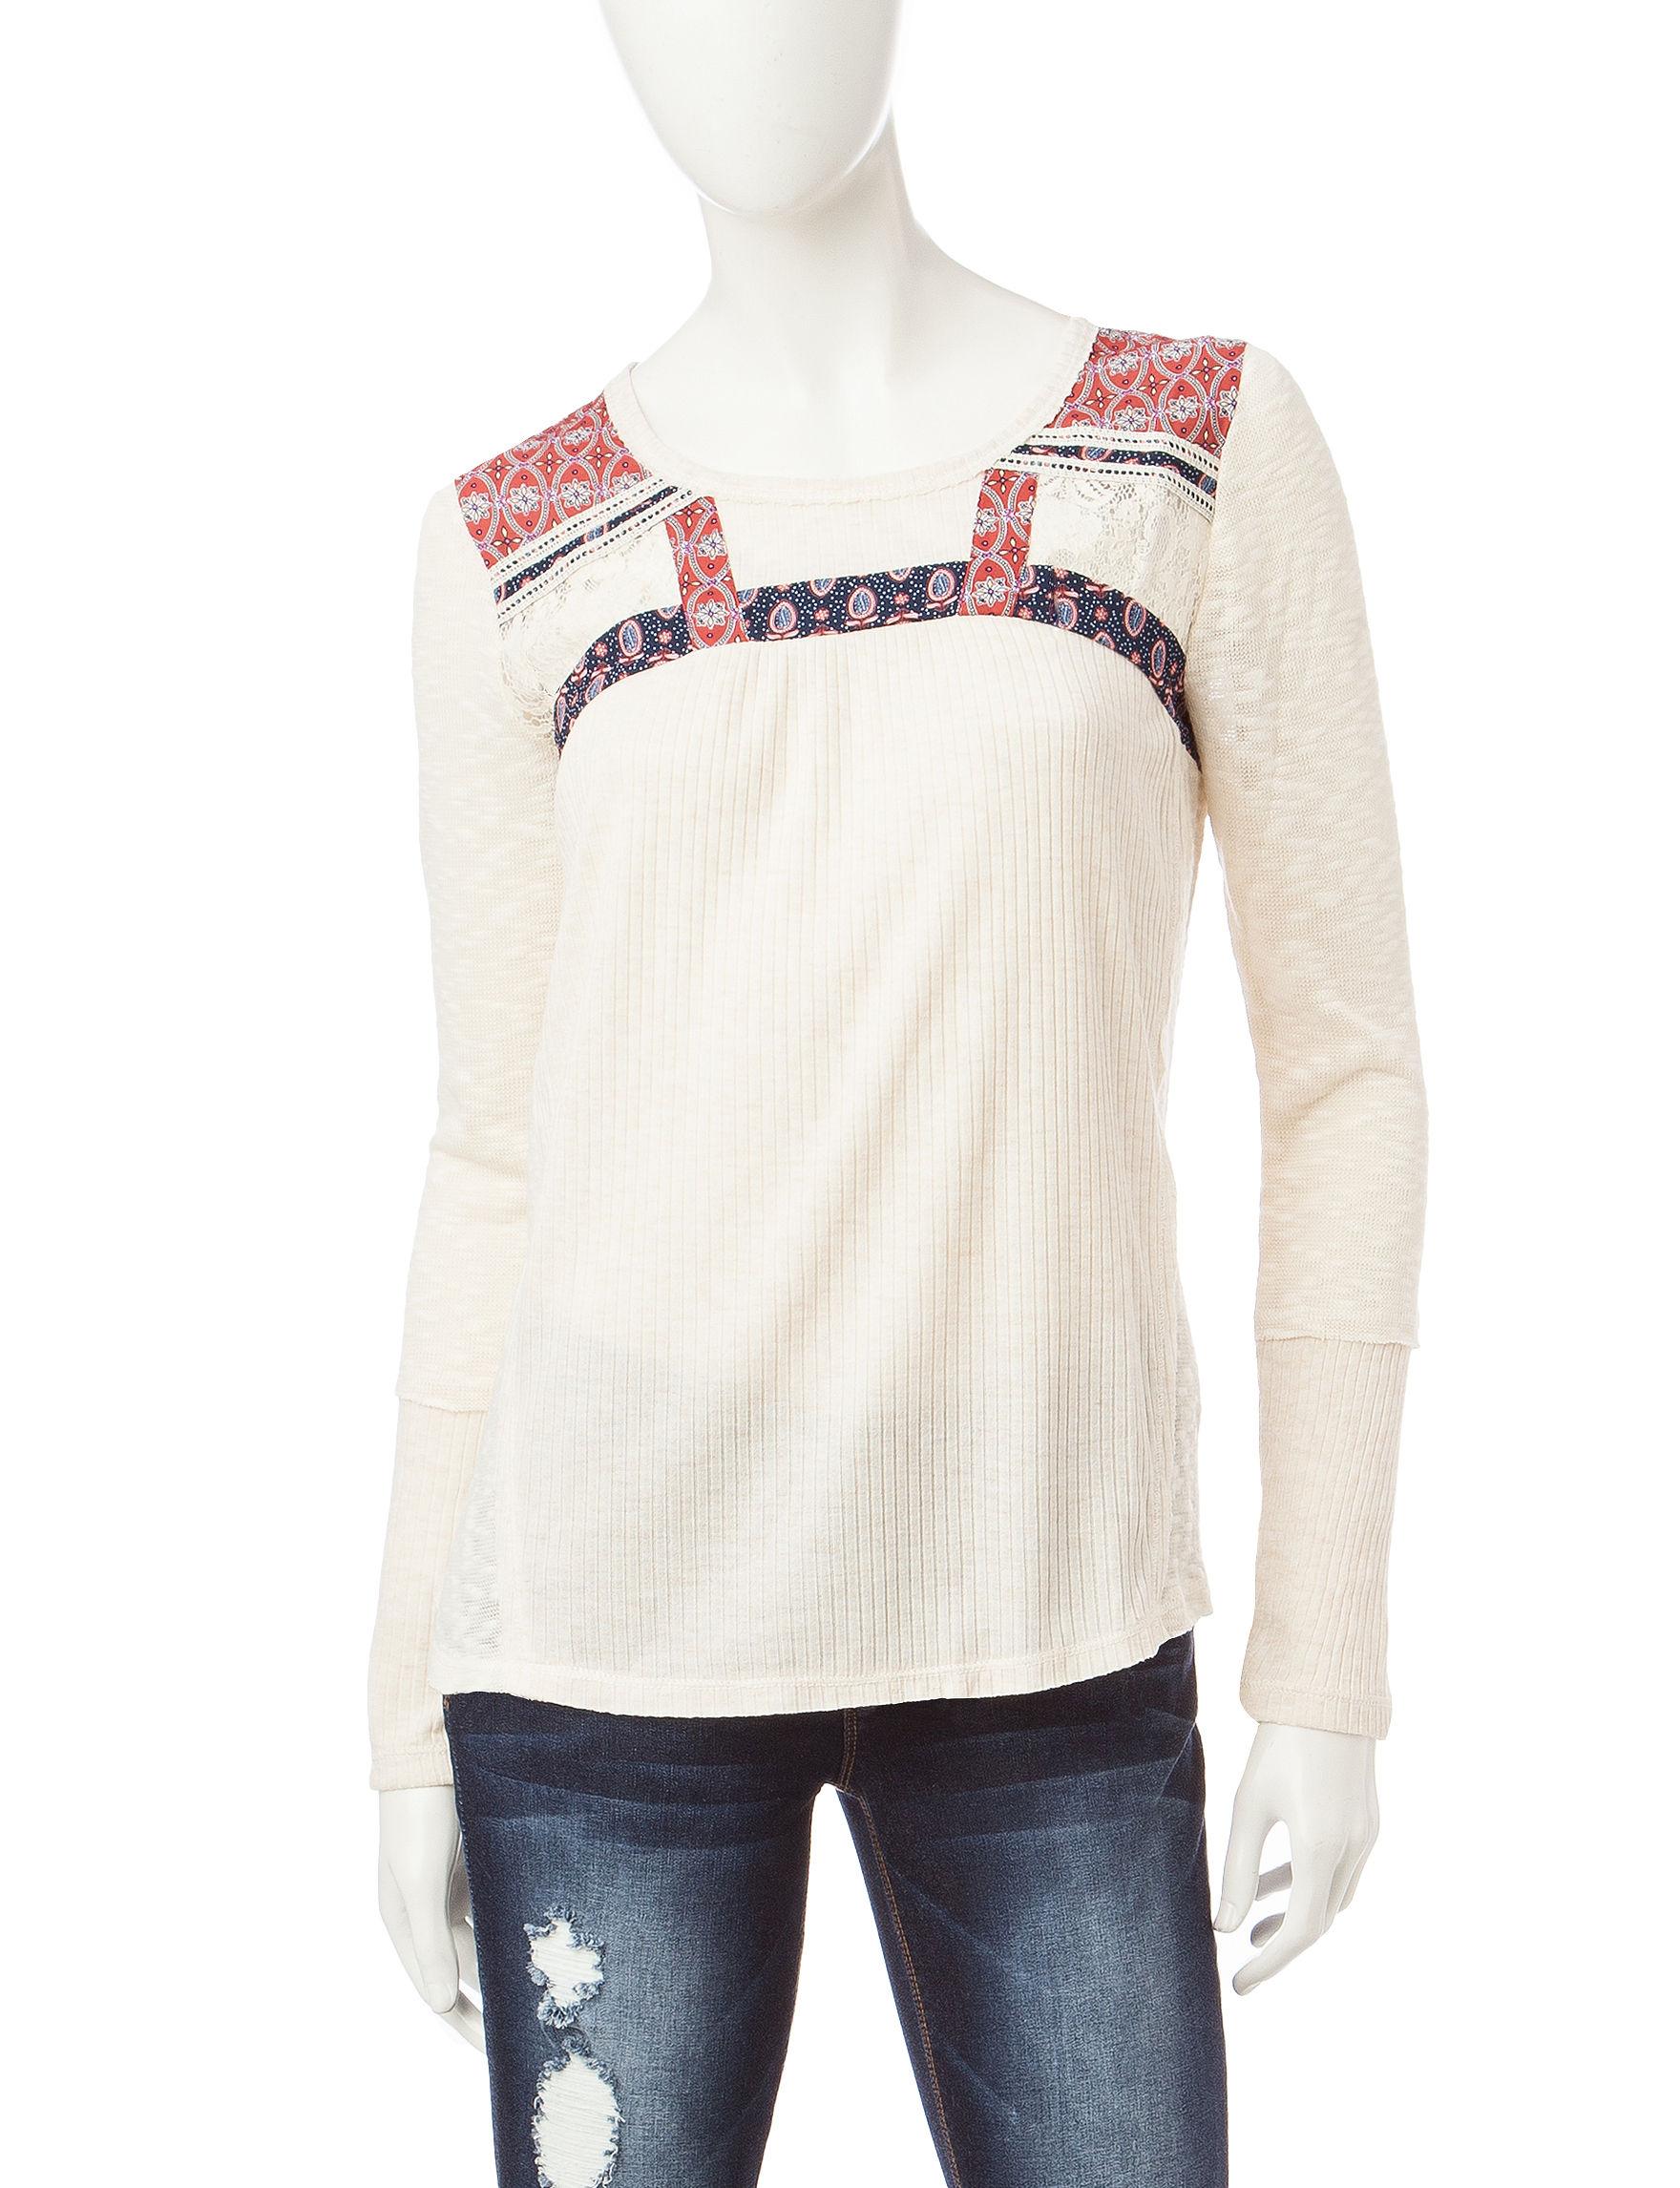 Jolt White Shirts & Blouses